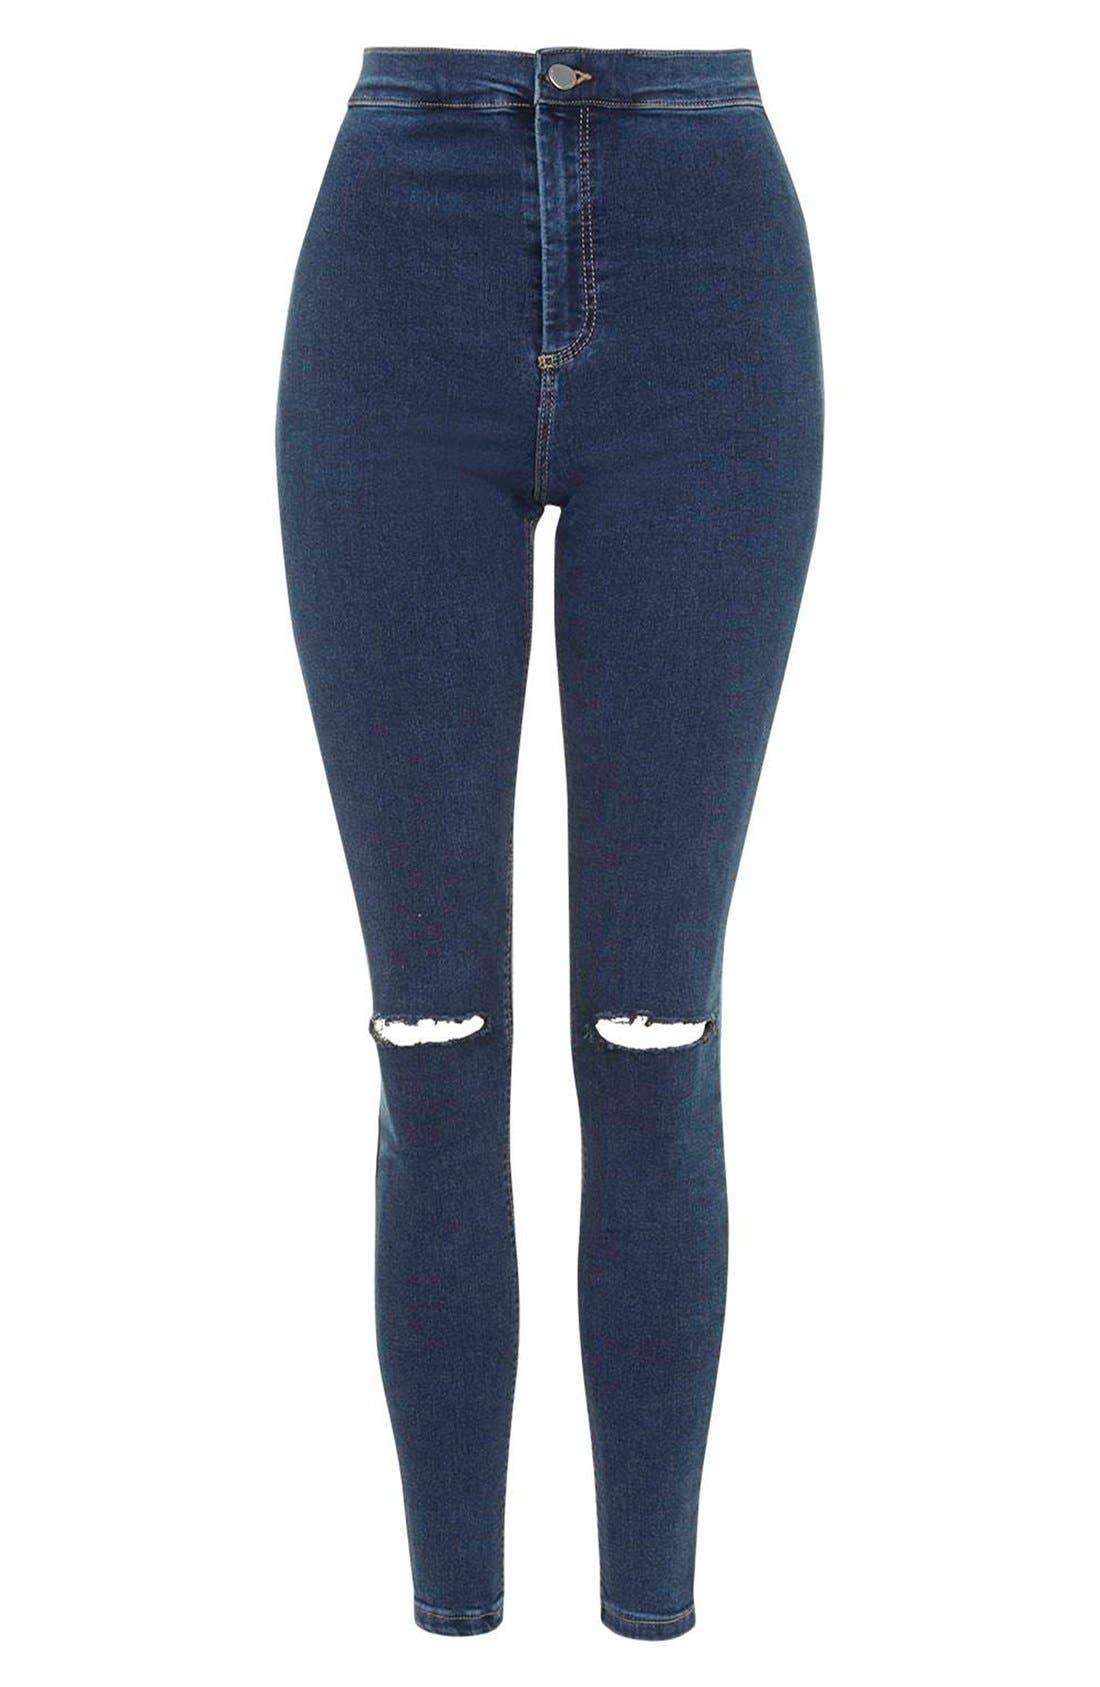 Alternate Image 4  - Topshop Moto'Joni' Ripped High Rise Skinny Jeans (Regular & Short)